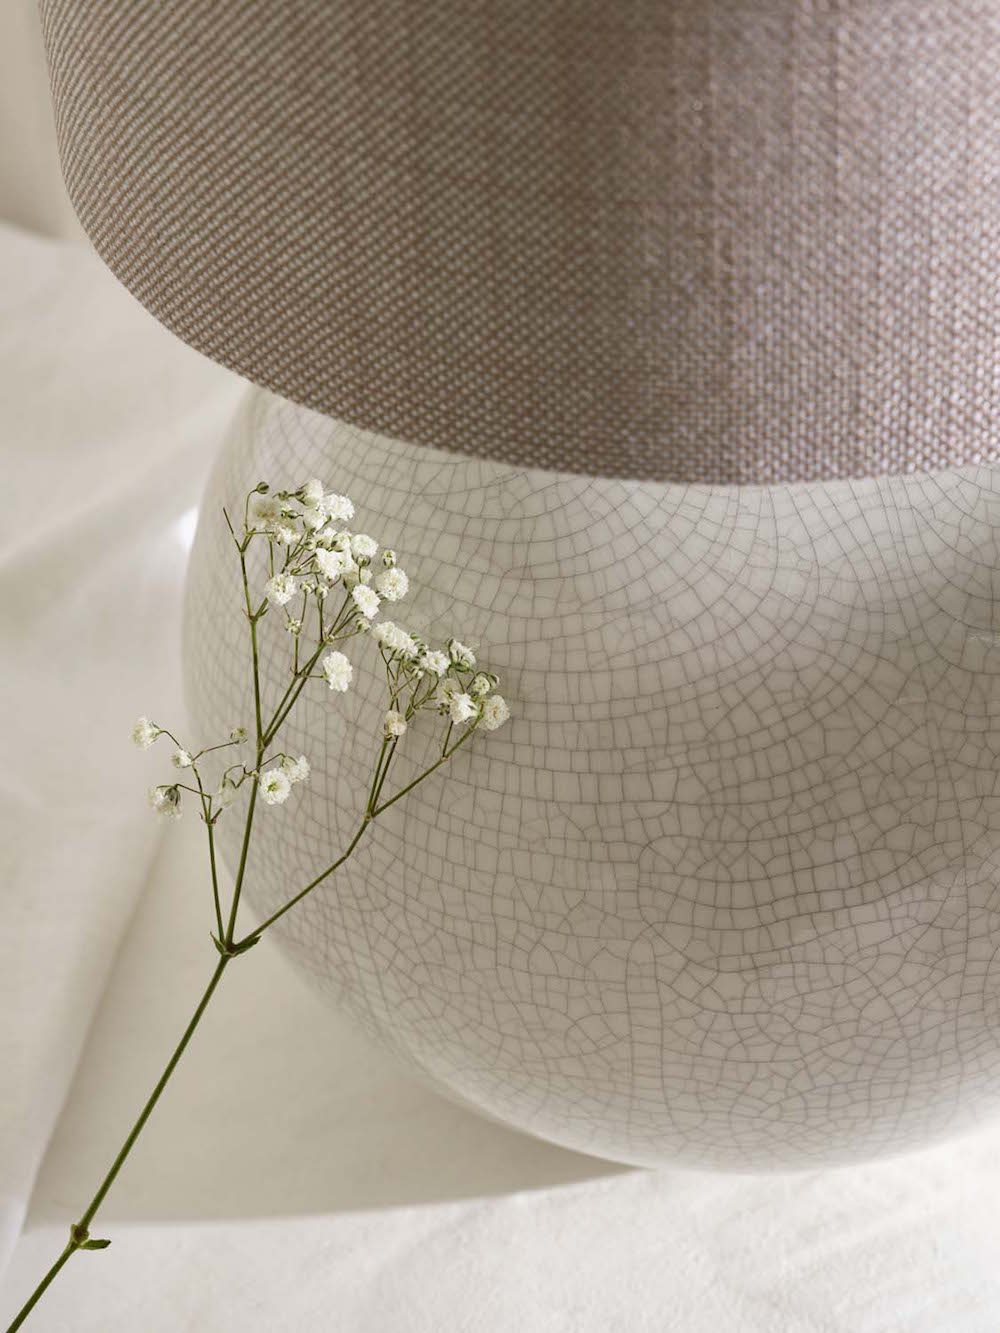 03. Heathfield & Co Camellia Table Lamp